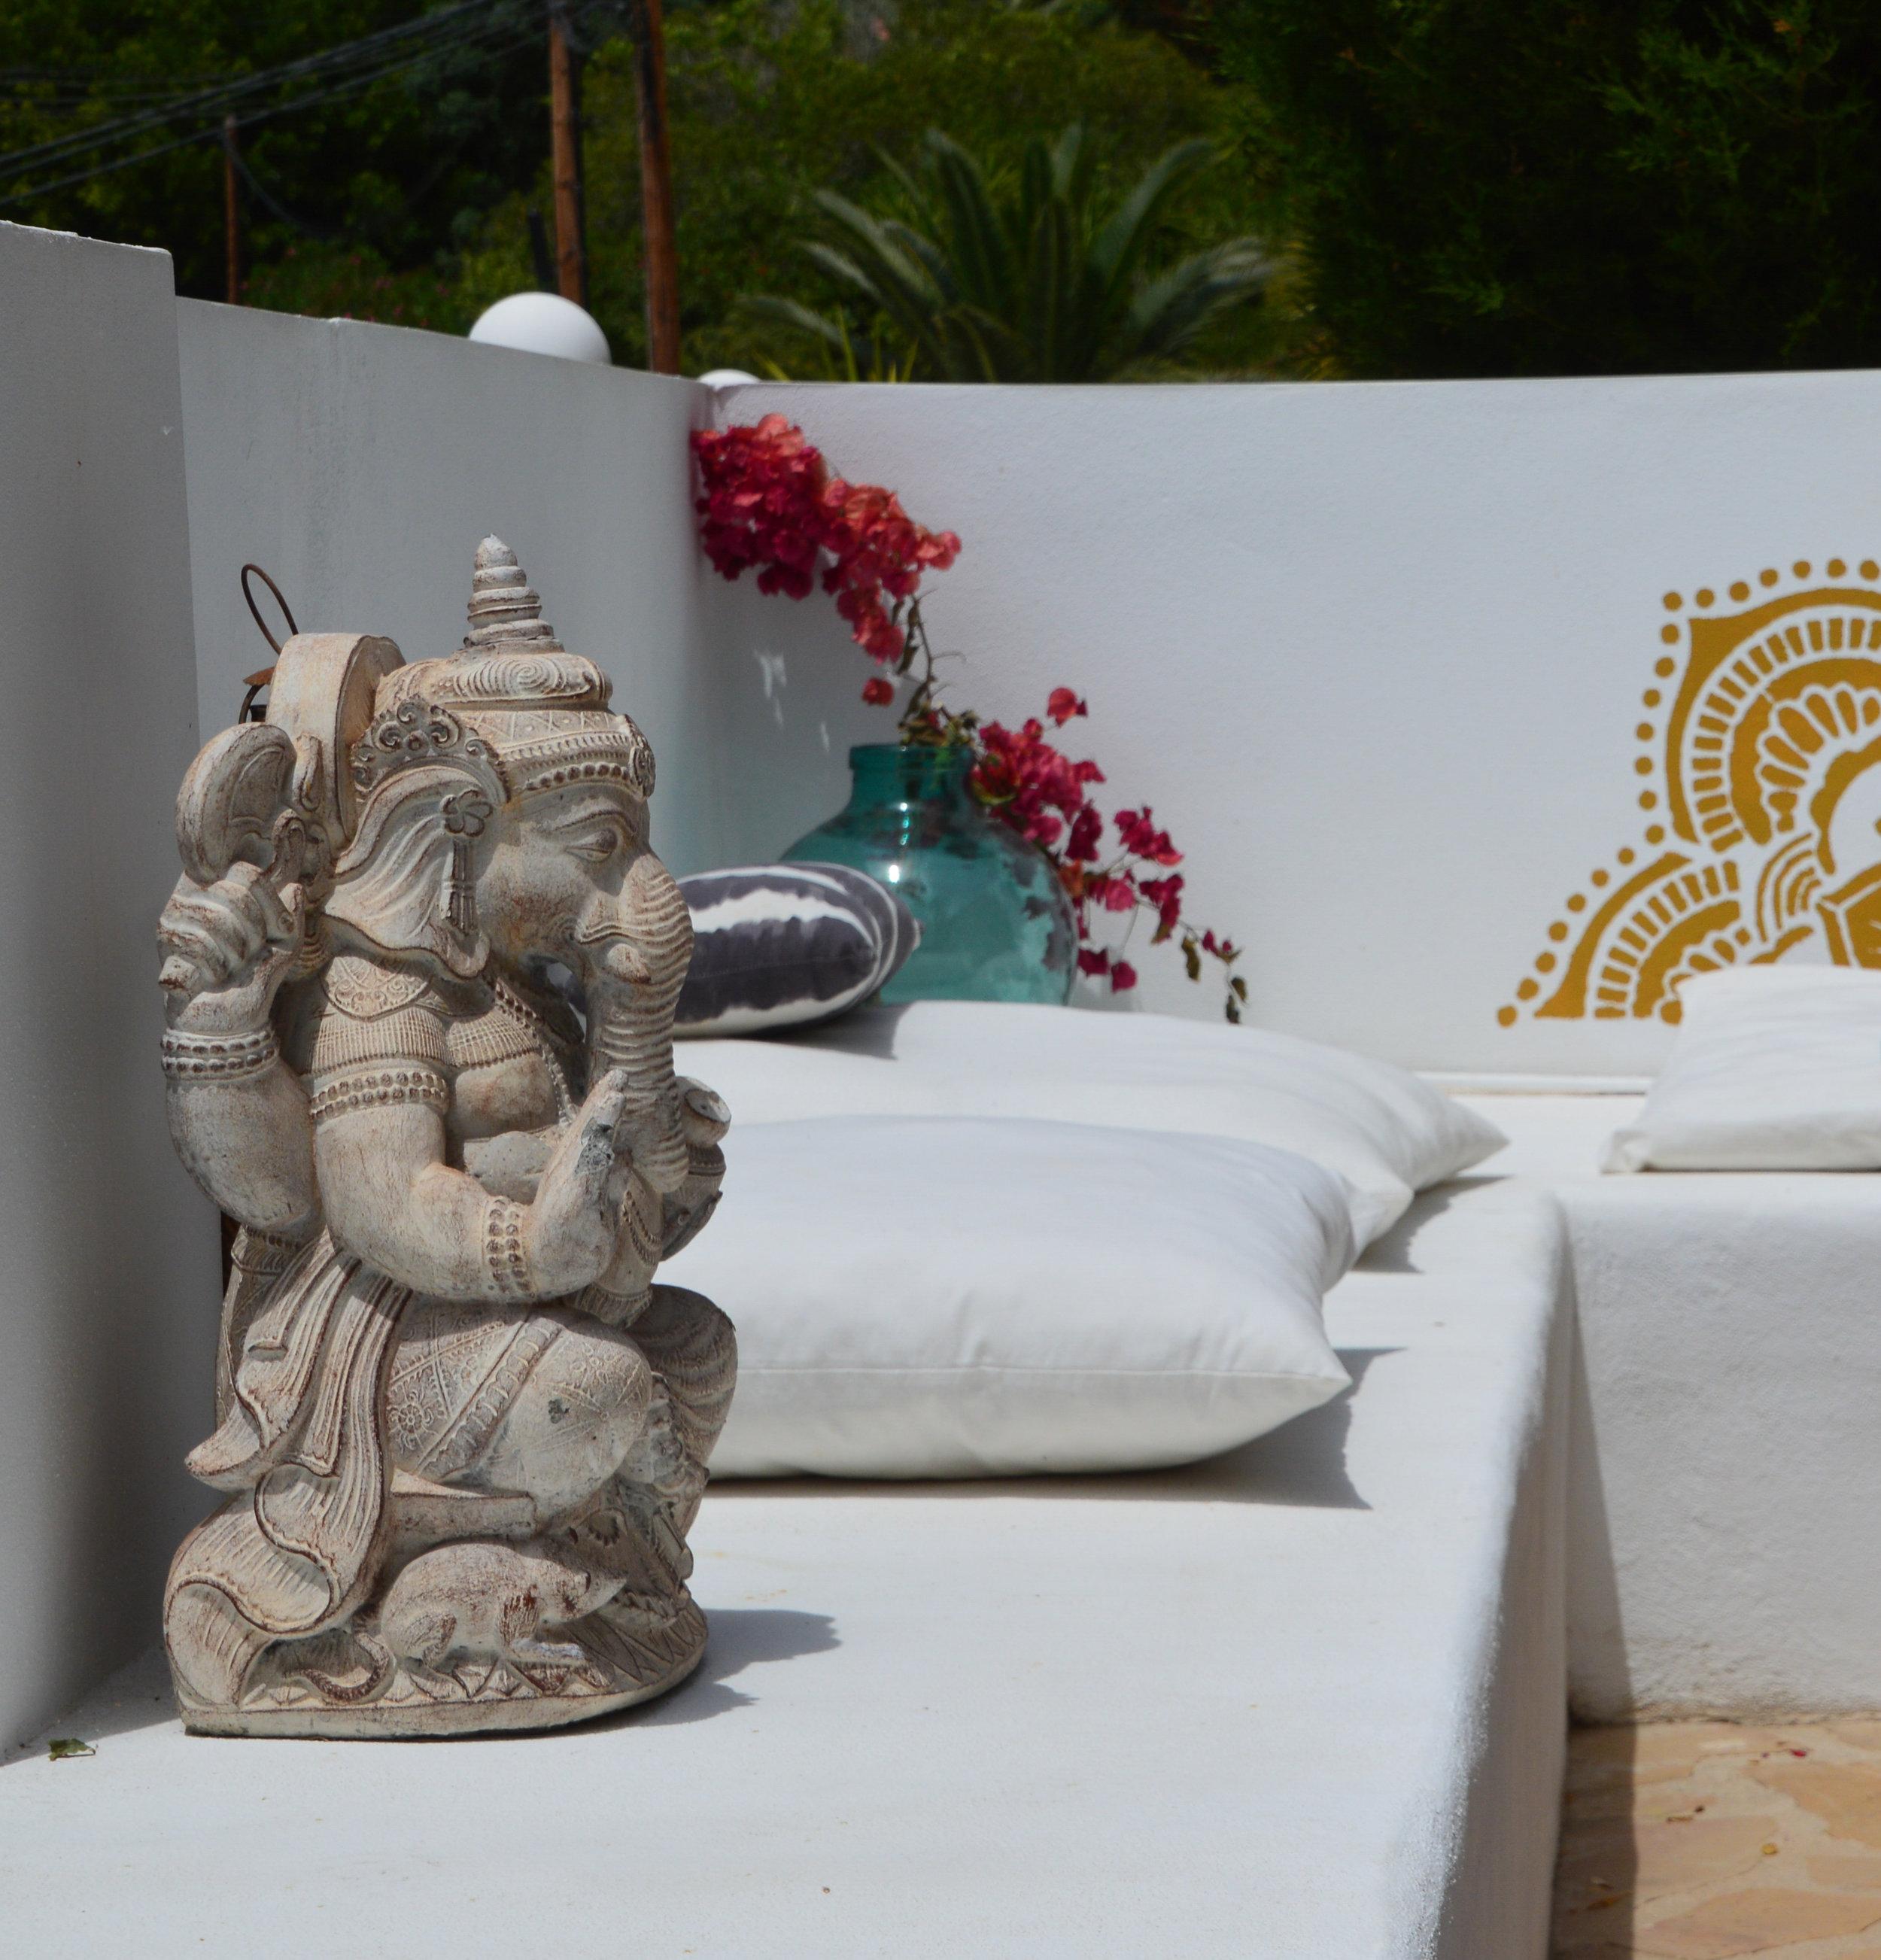 Ganesh is watching